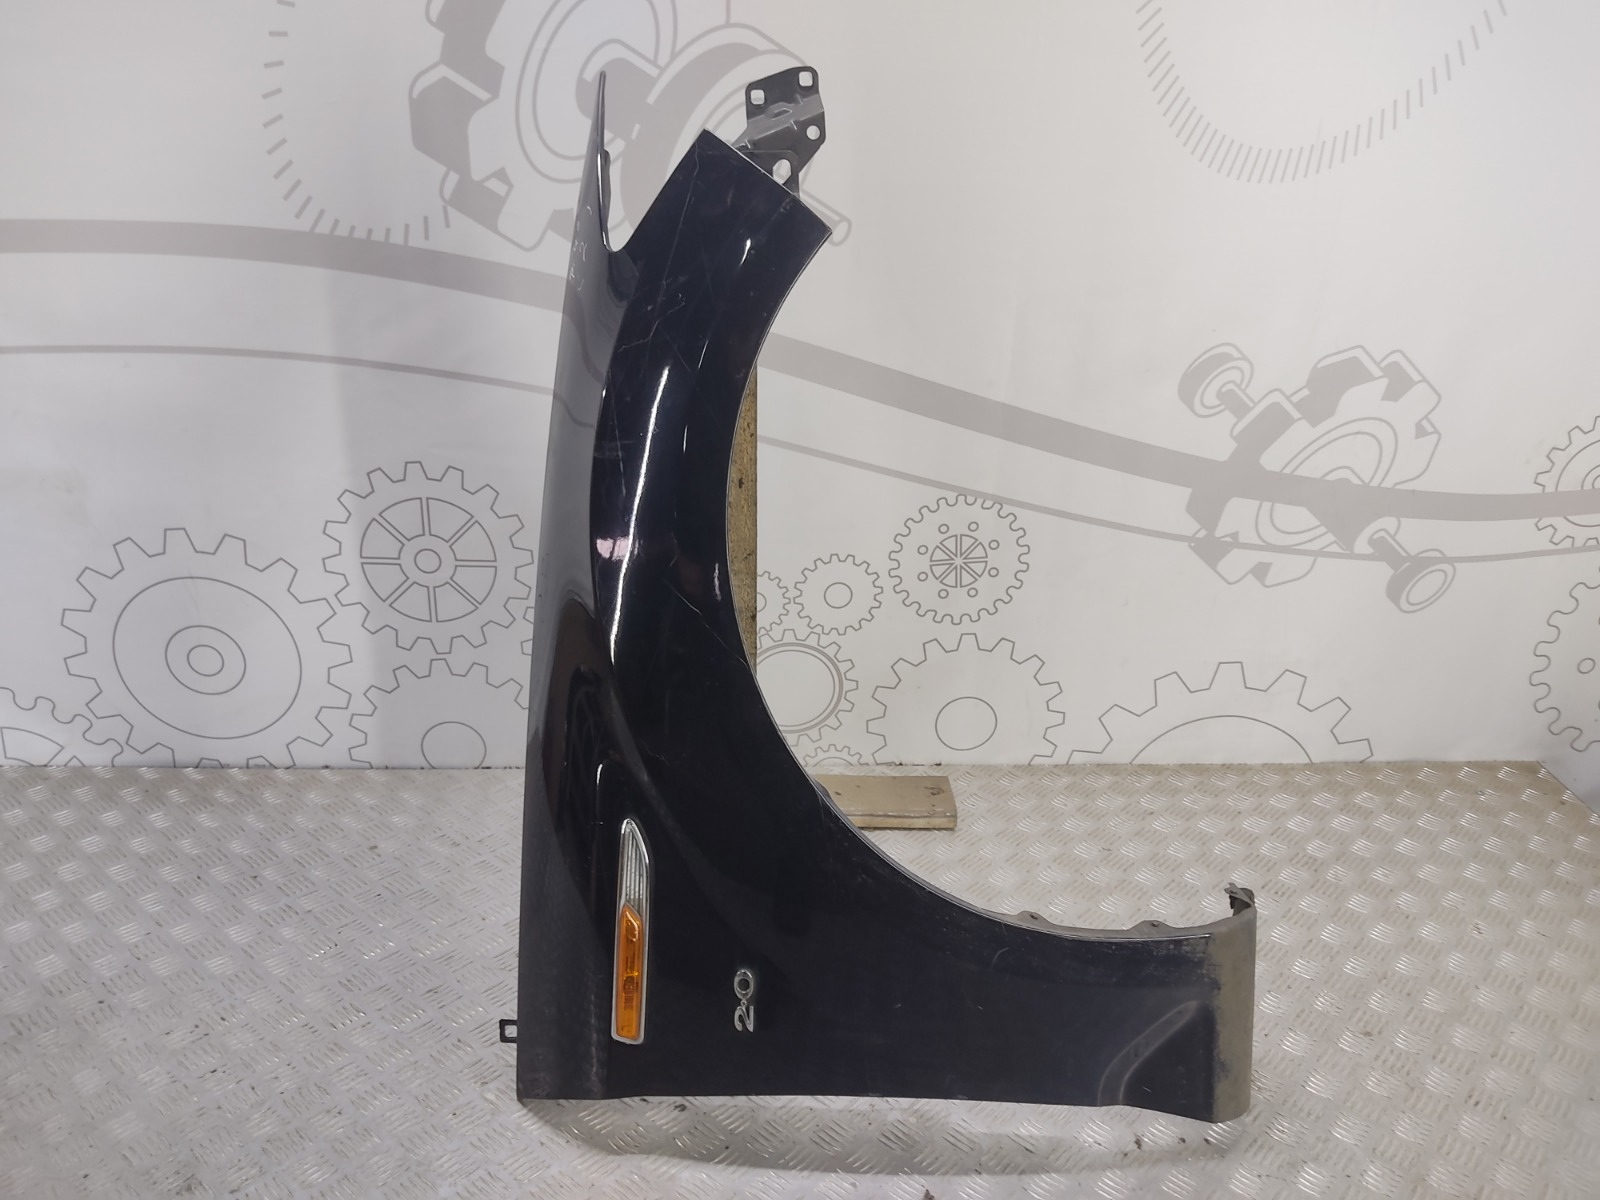 Крыло переднее правое Ford Mondeo 2.0 TDCI 2007 (б/у)